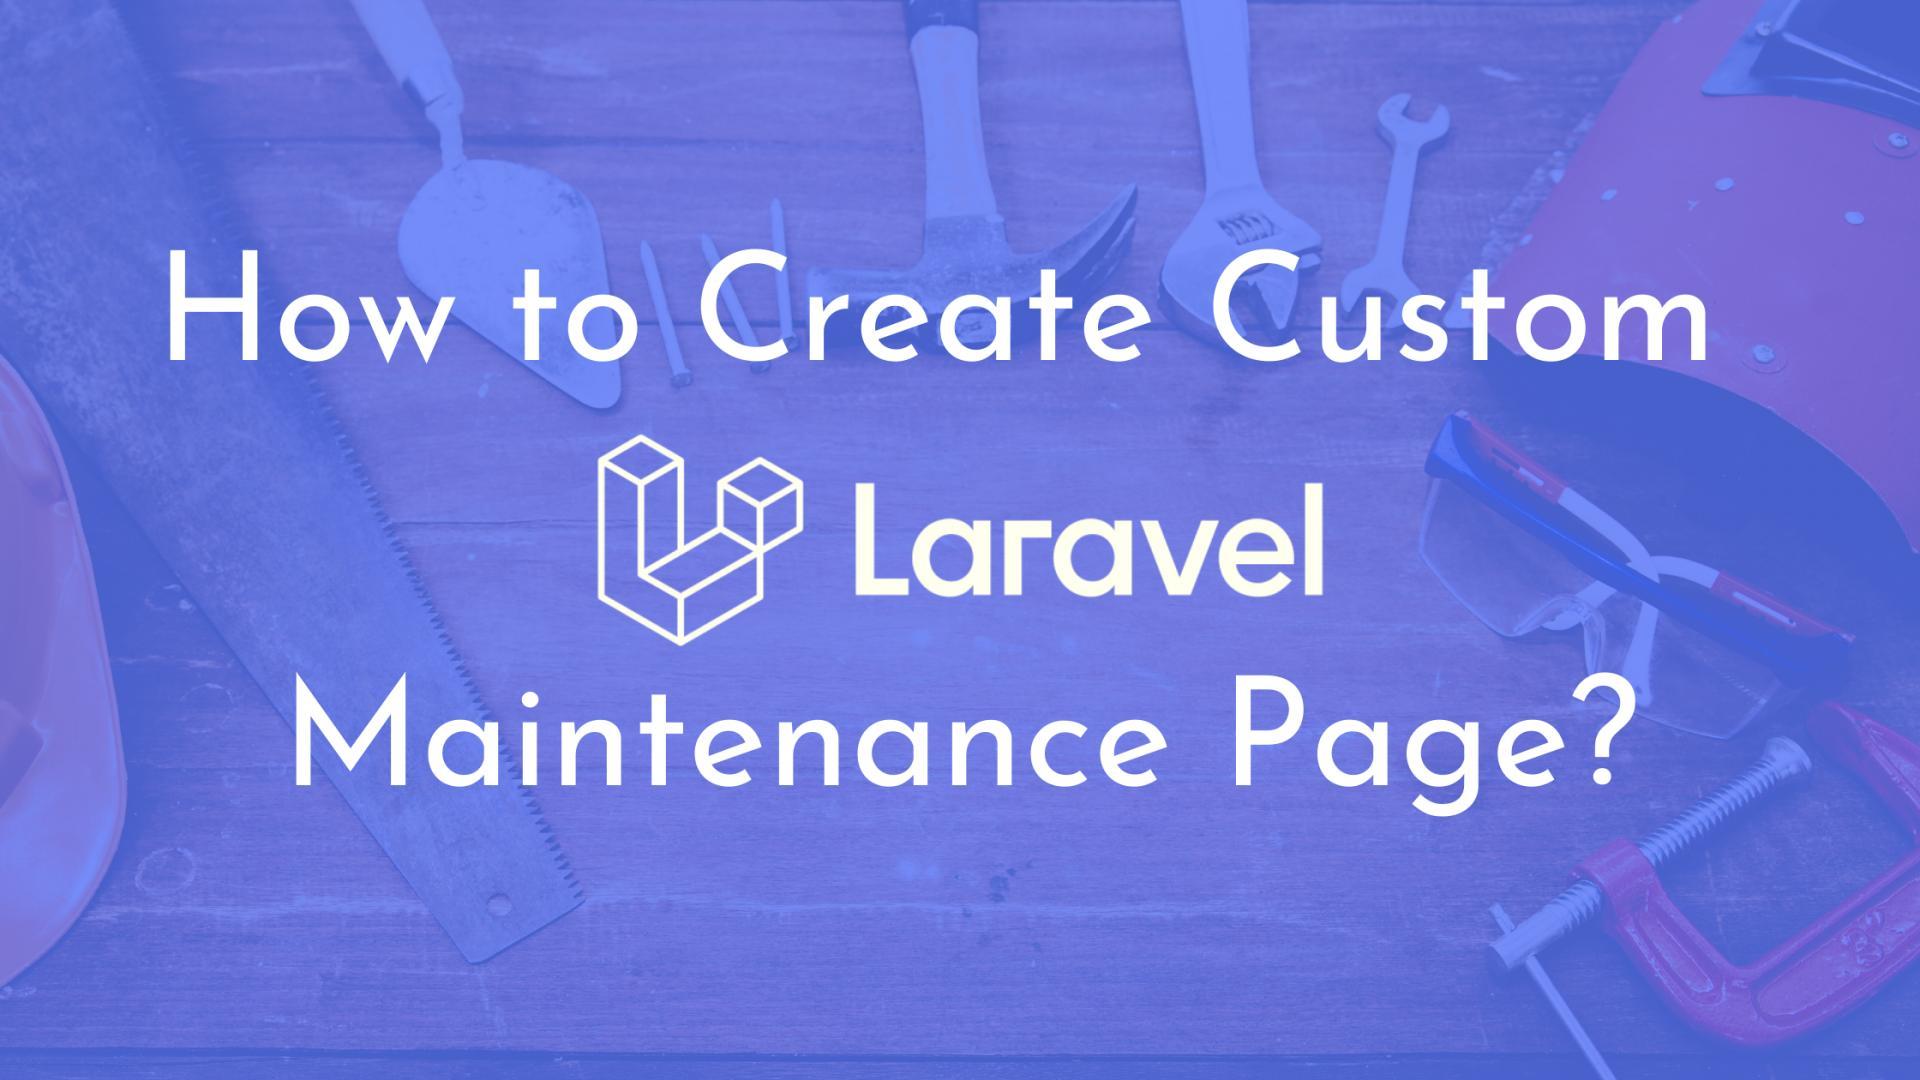 How to Create Custom Laravel Maintenance Page?